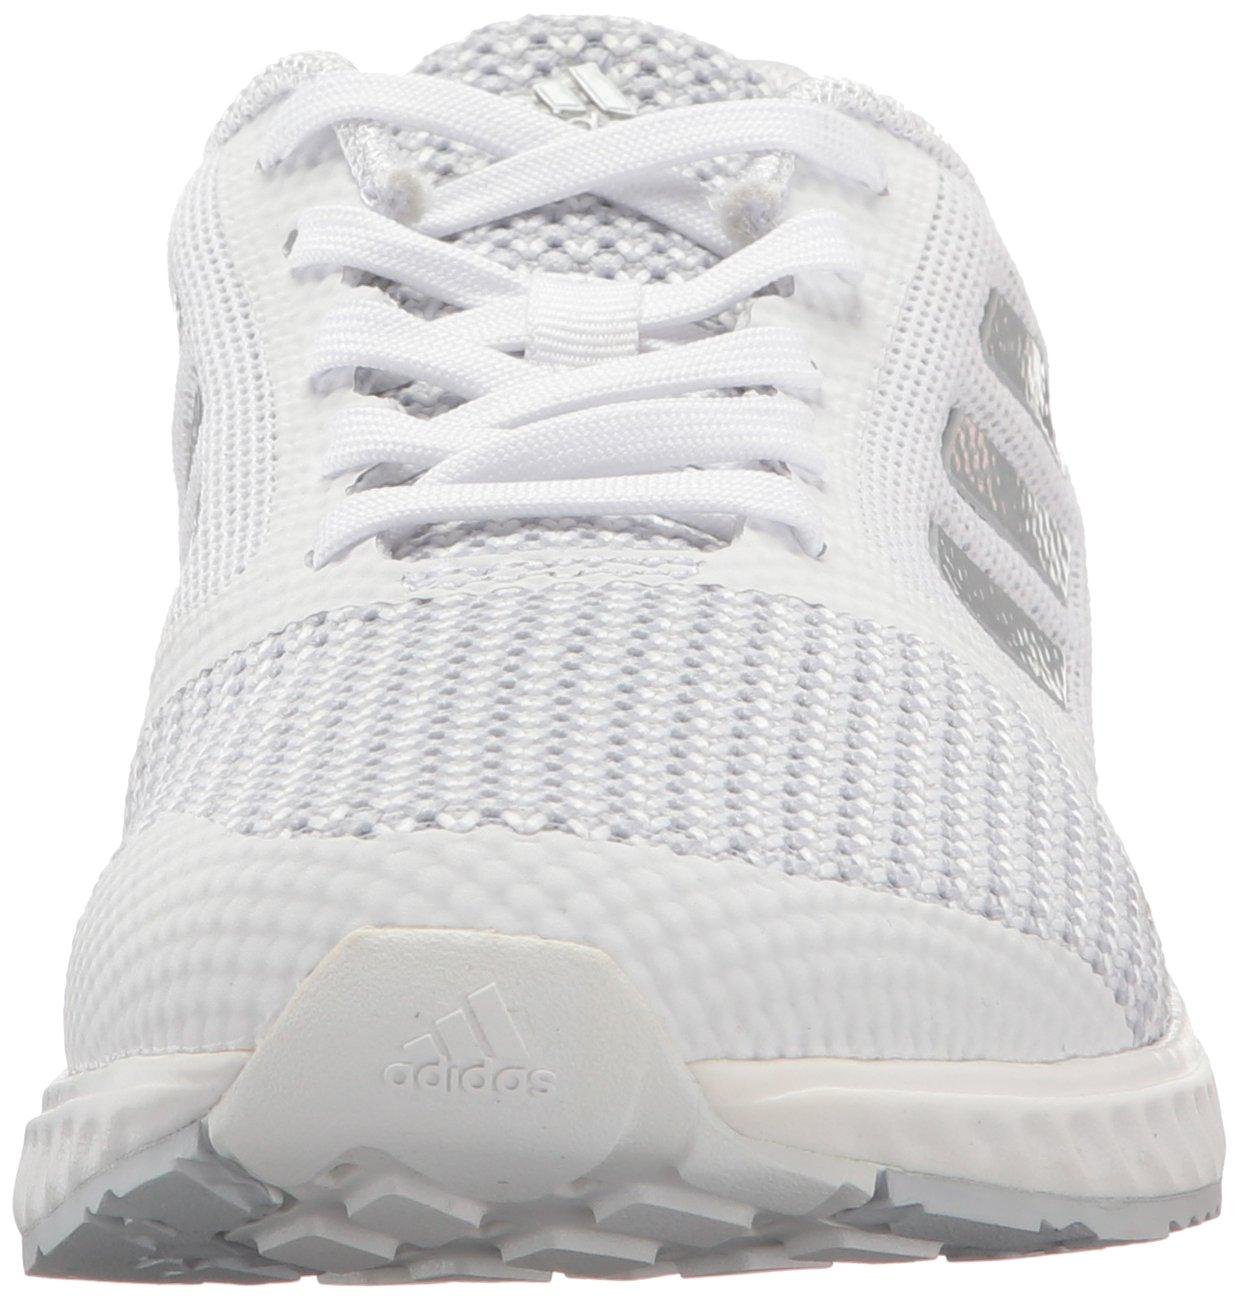 Zapatillas s de W running Zapatillas adidas Women s Edge W Rc W gris Zapatillas 4569937 - allpoints.host